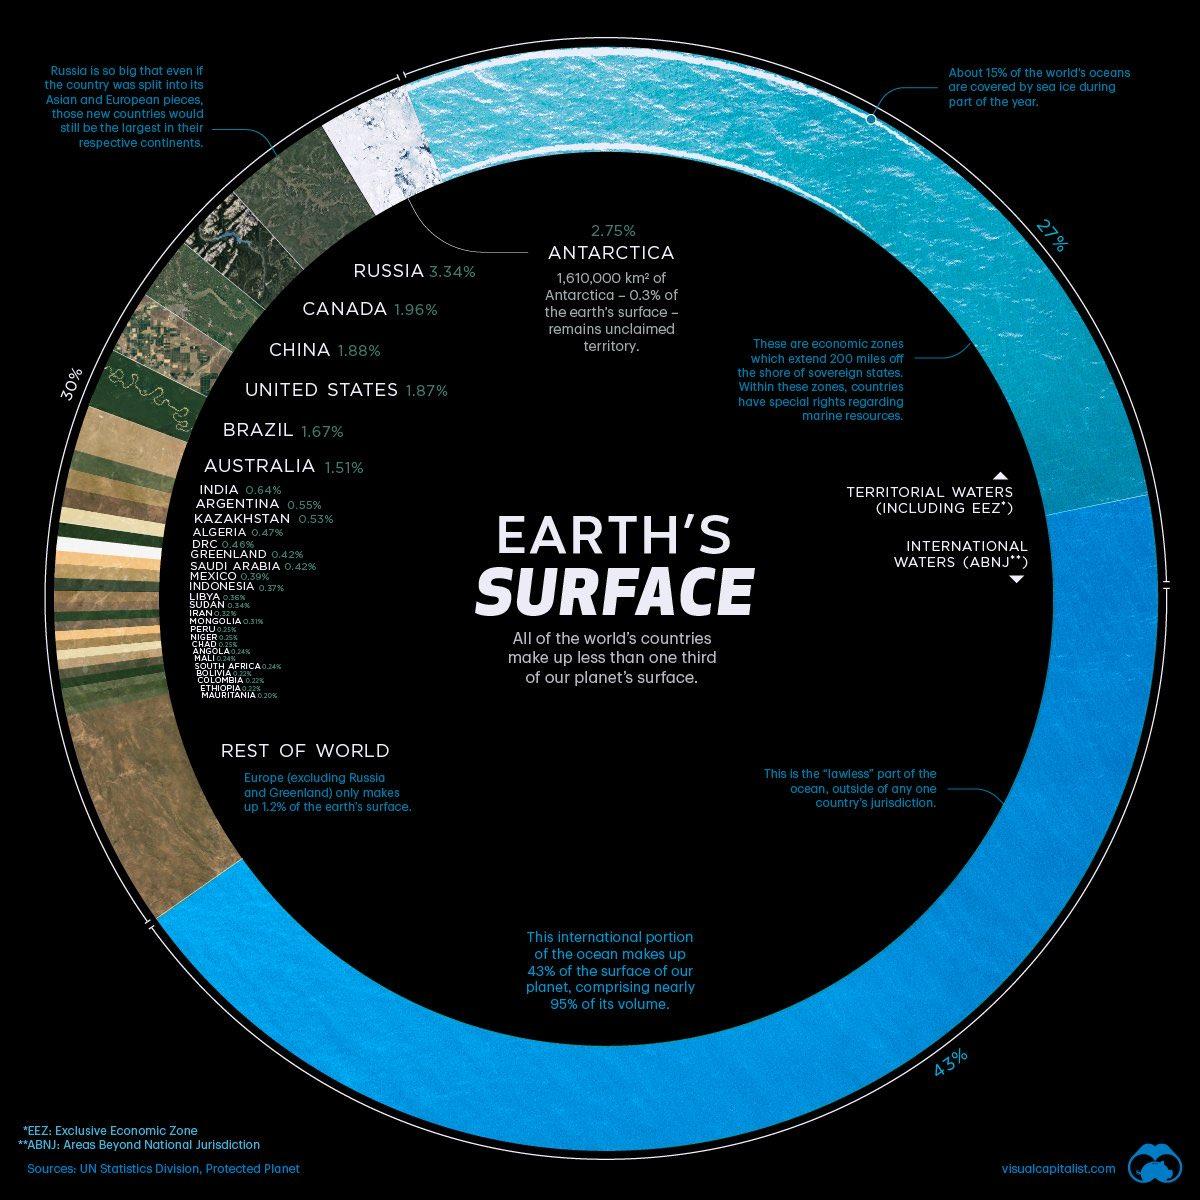 EARTH'S SURFACE  #EarthDay  #earth  #science https://t.co/clUpu53eLa